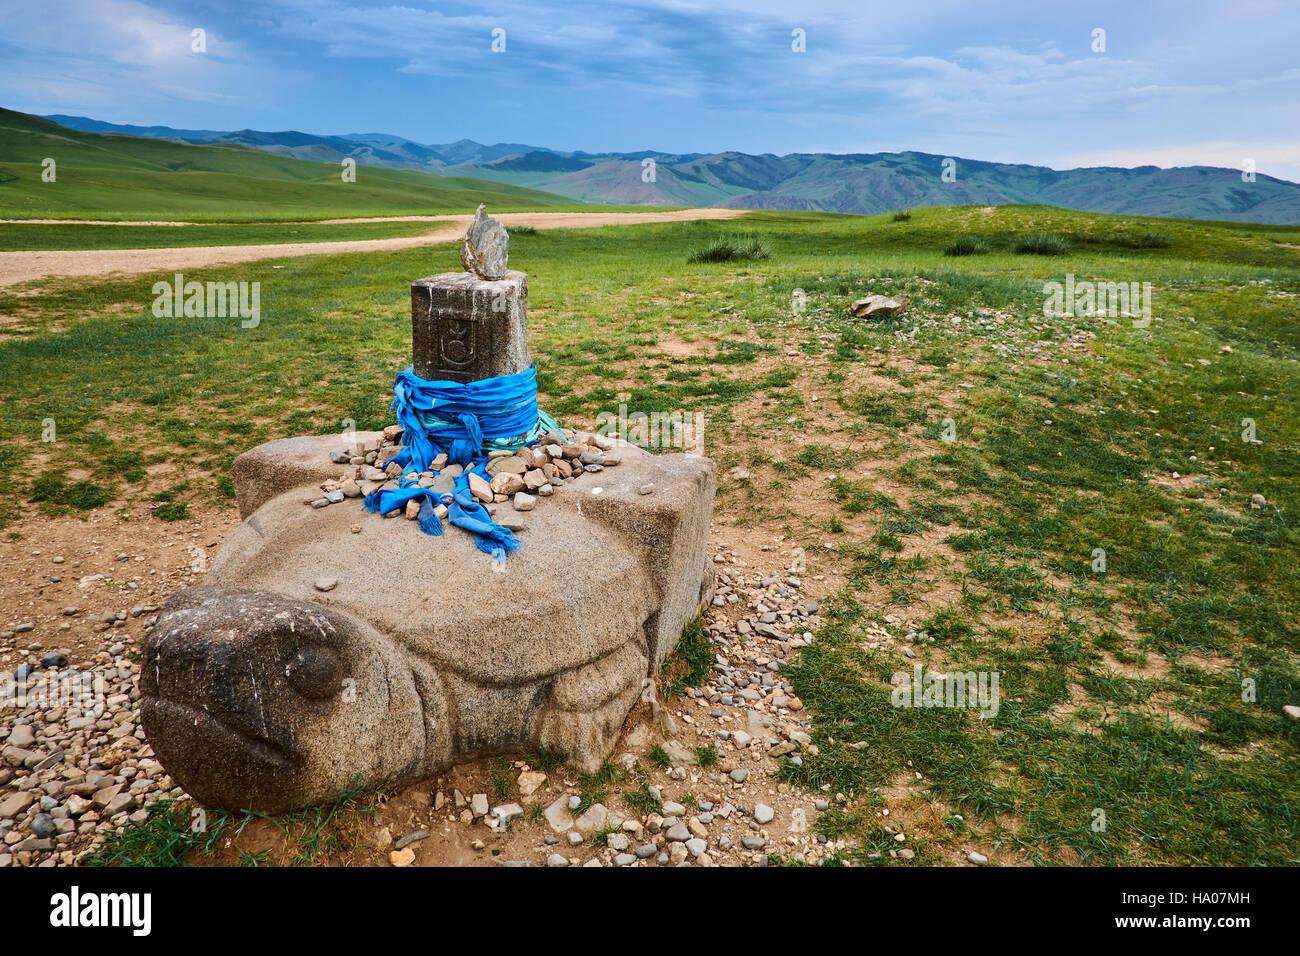 Mongolia, Ovorkhangai, Kharkhorin, valle del Orkhon, patrimonio mundial de la Unesco, la sagrada tortuga Imagen De Stock